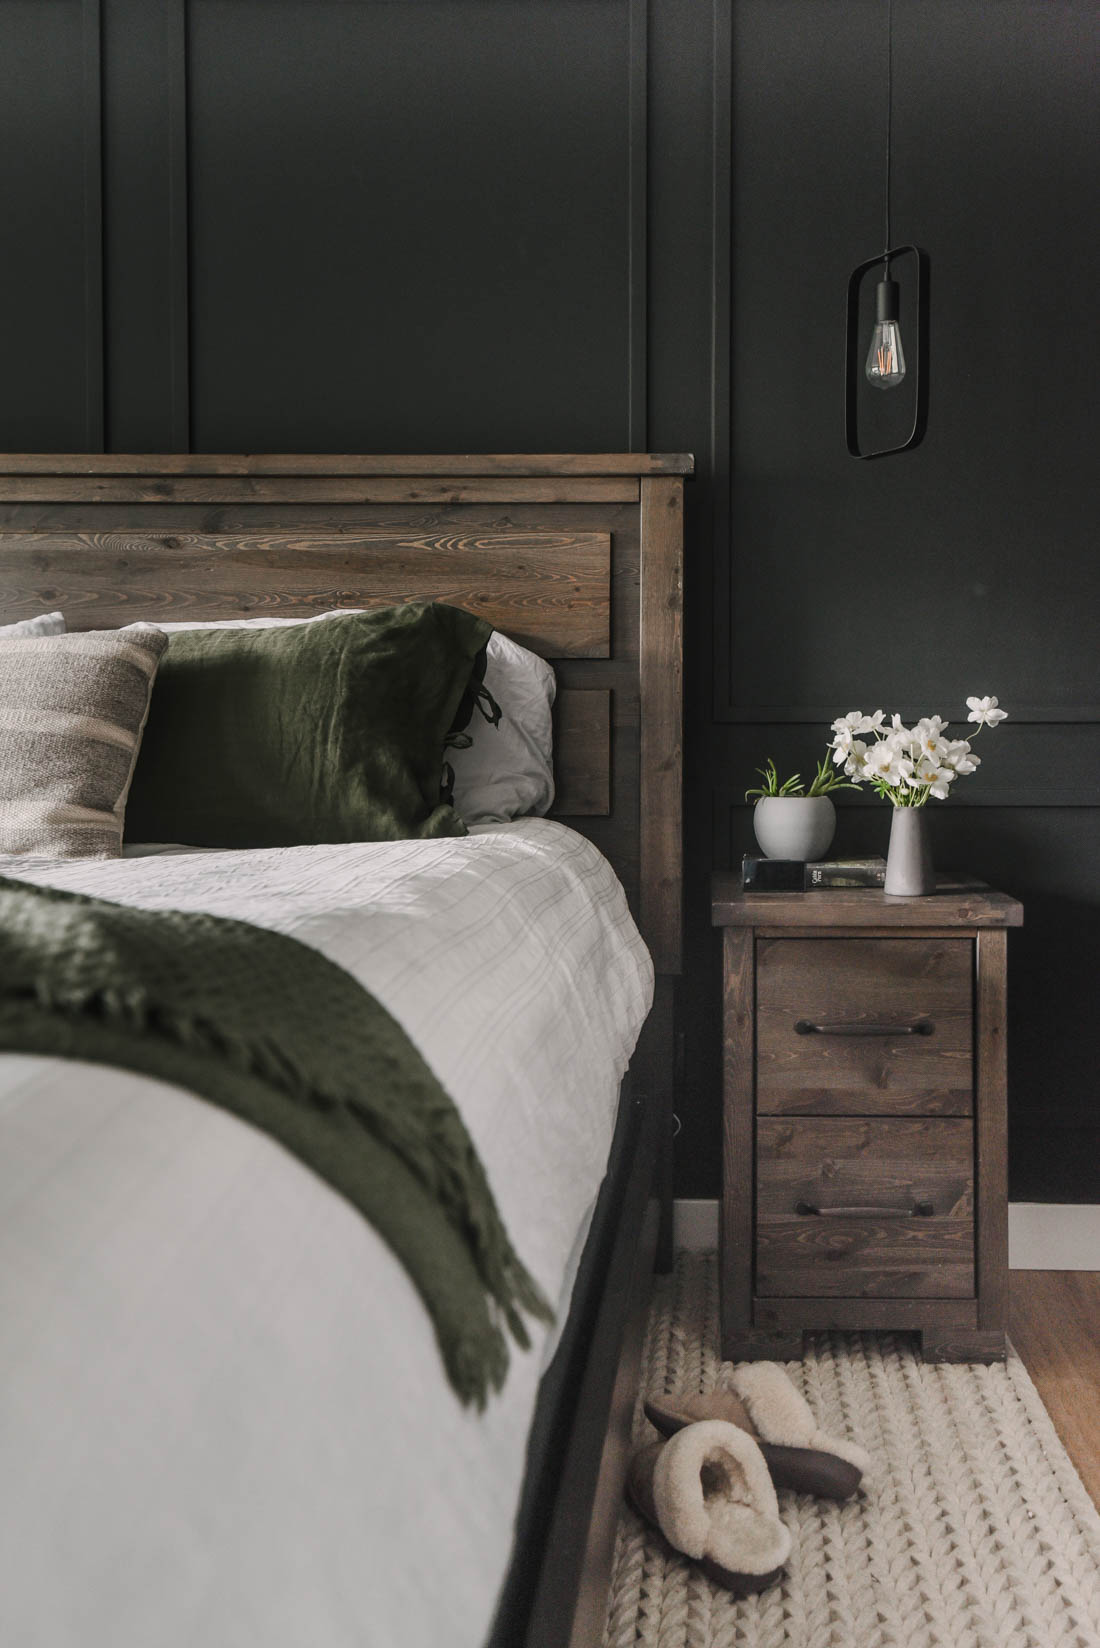 Black bedroom with wood furniture